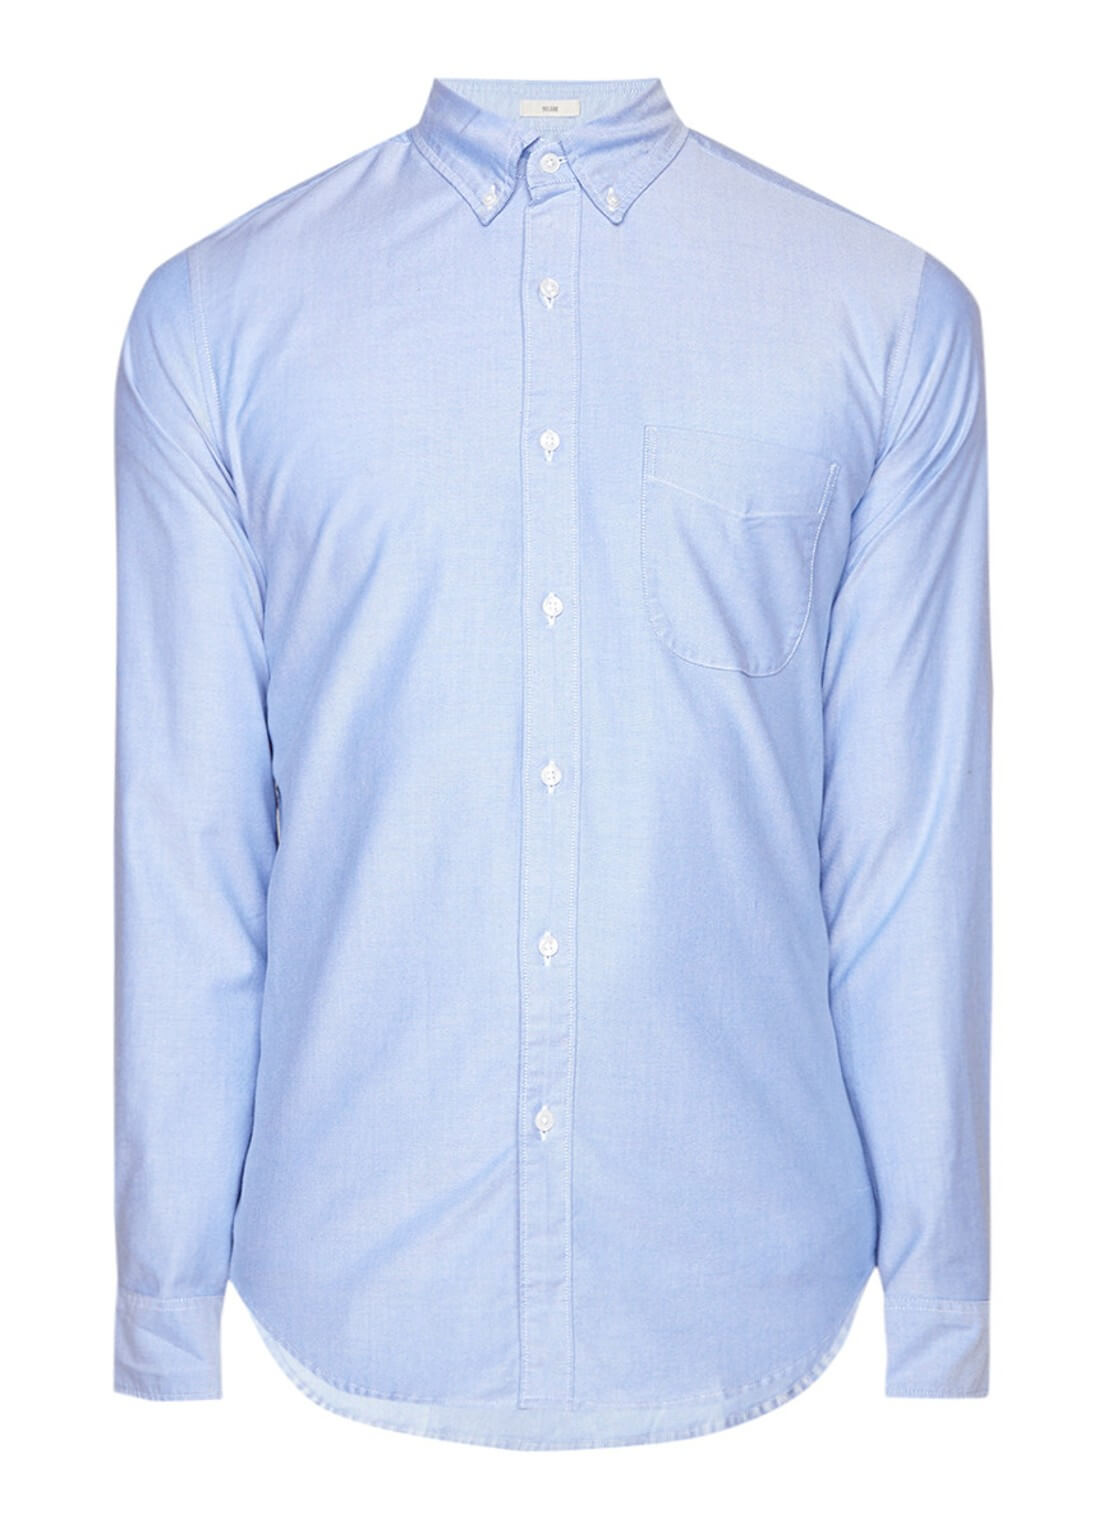 Shirts - Mr.Draper